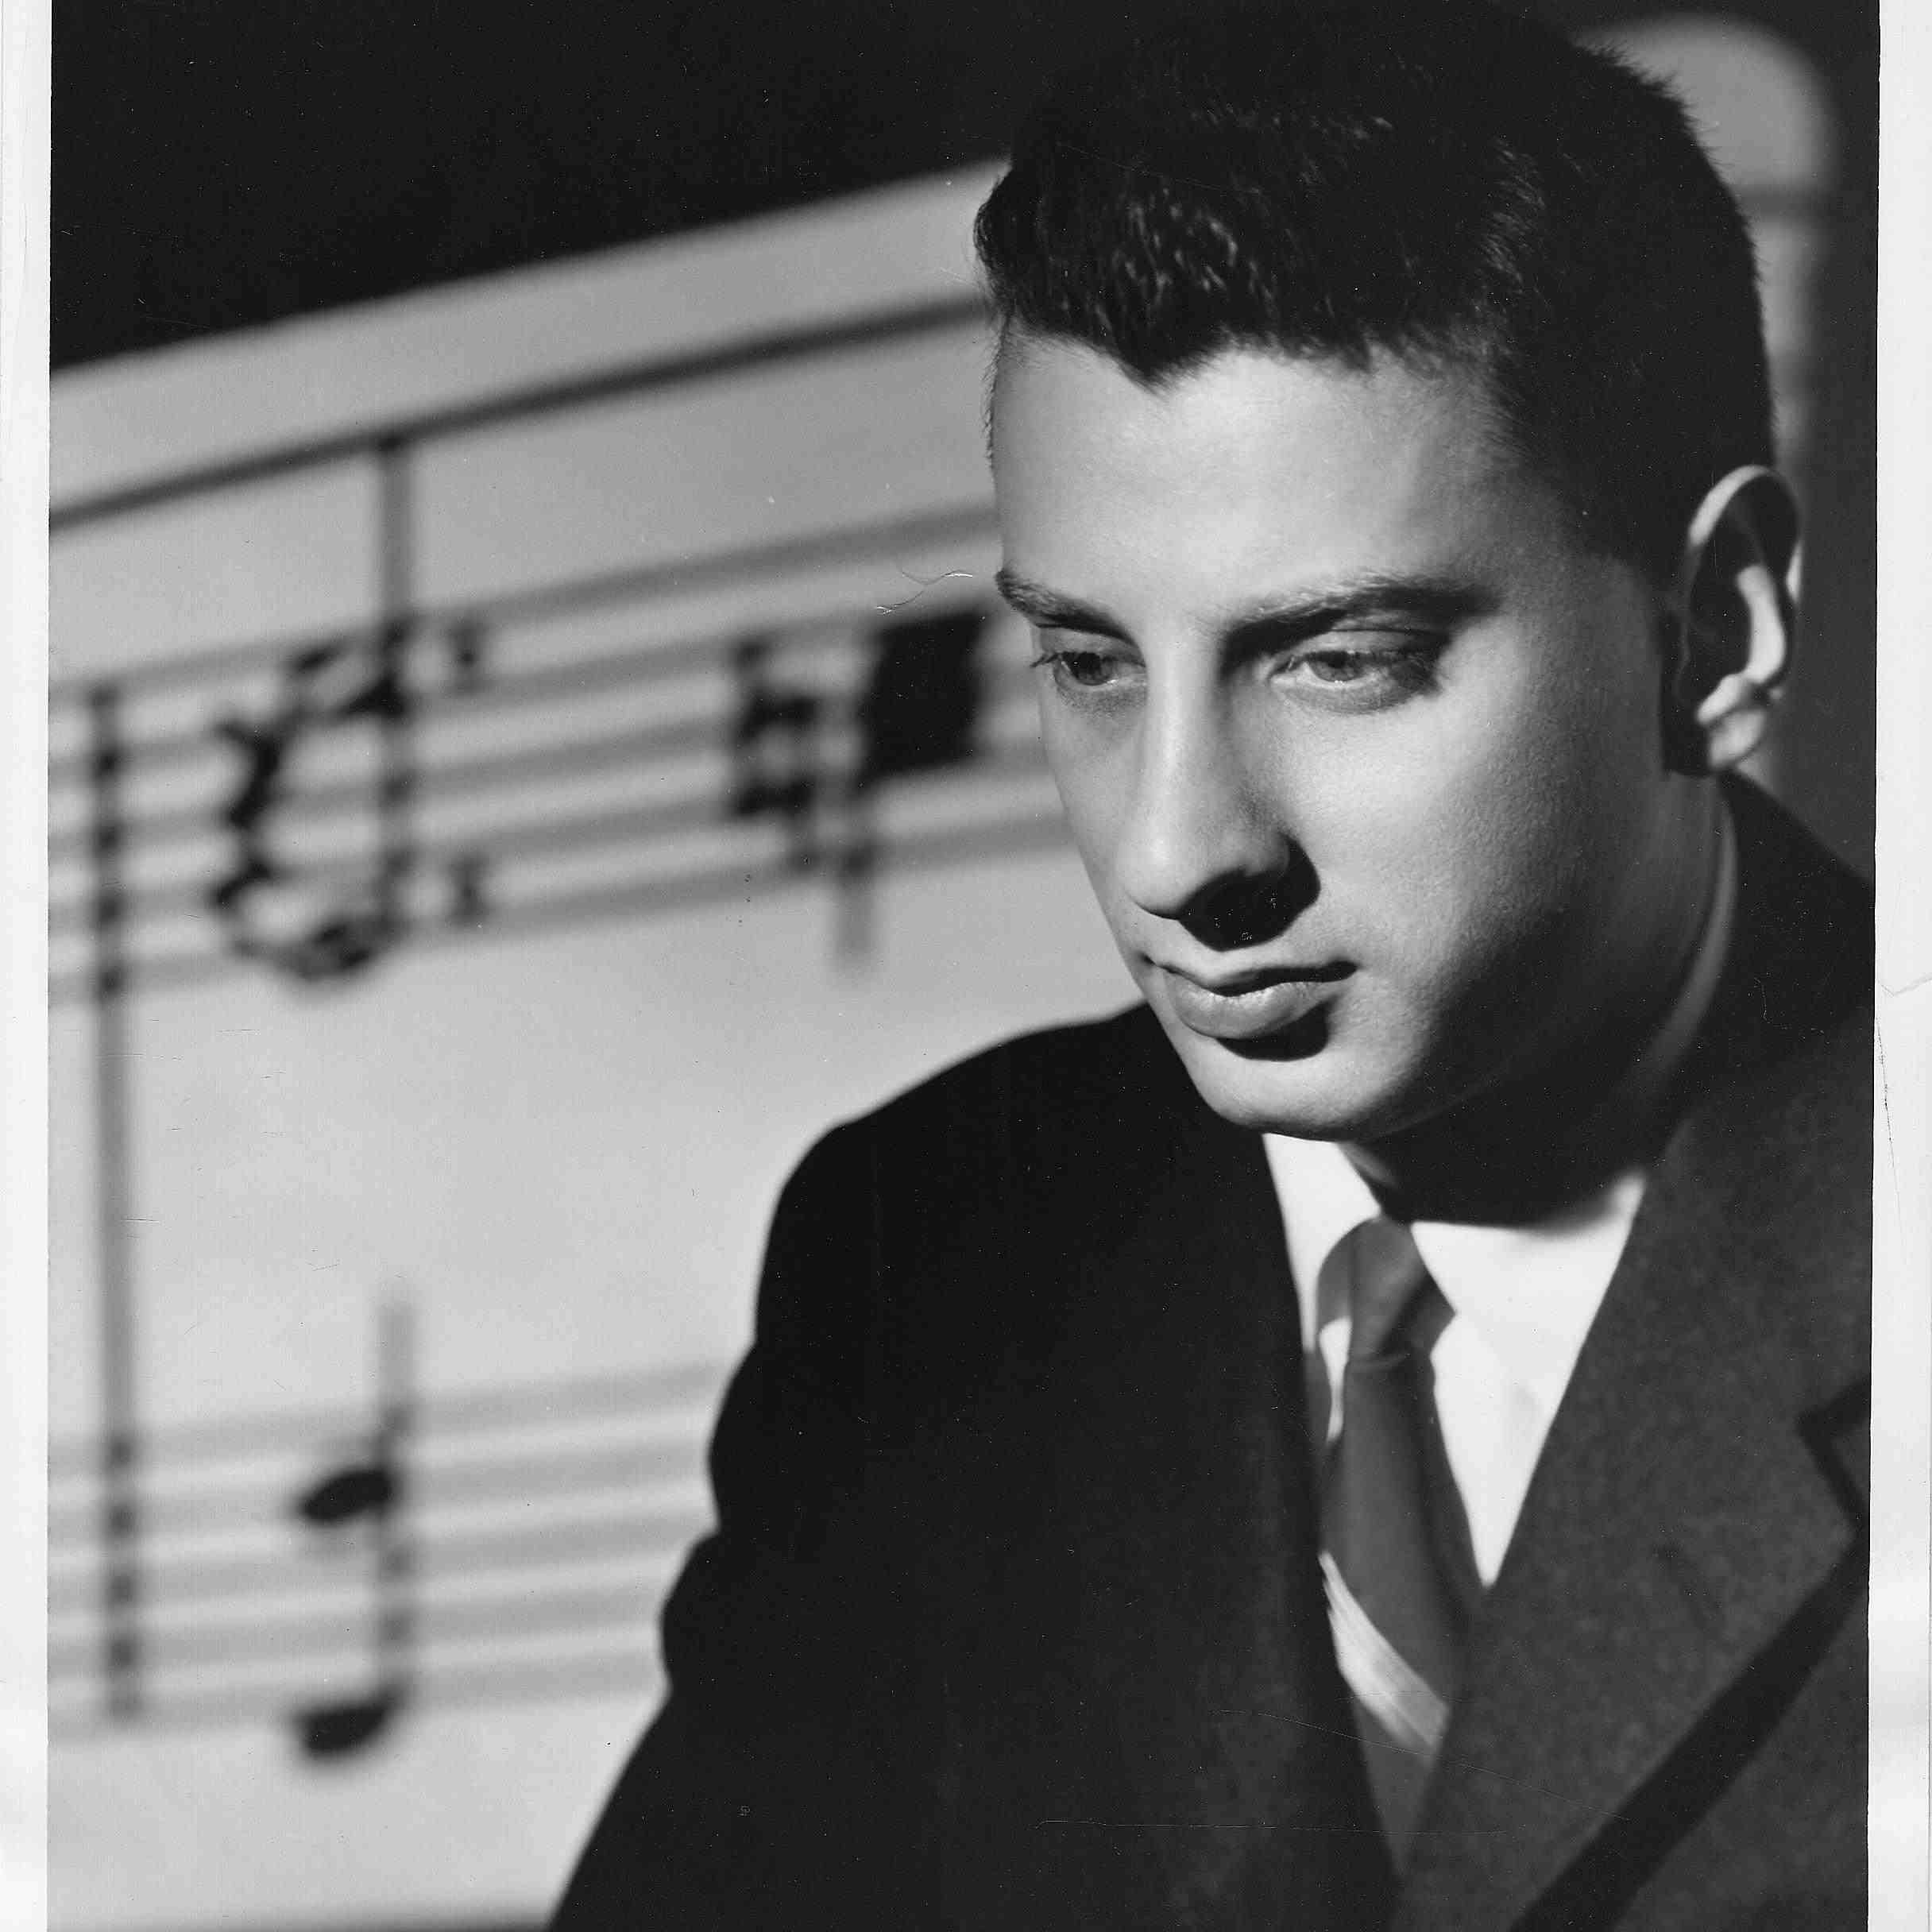 Dick-Hyman-c.-1960-Gilles-Petard-Redferns-Getty.jpg